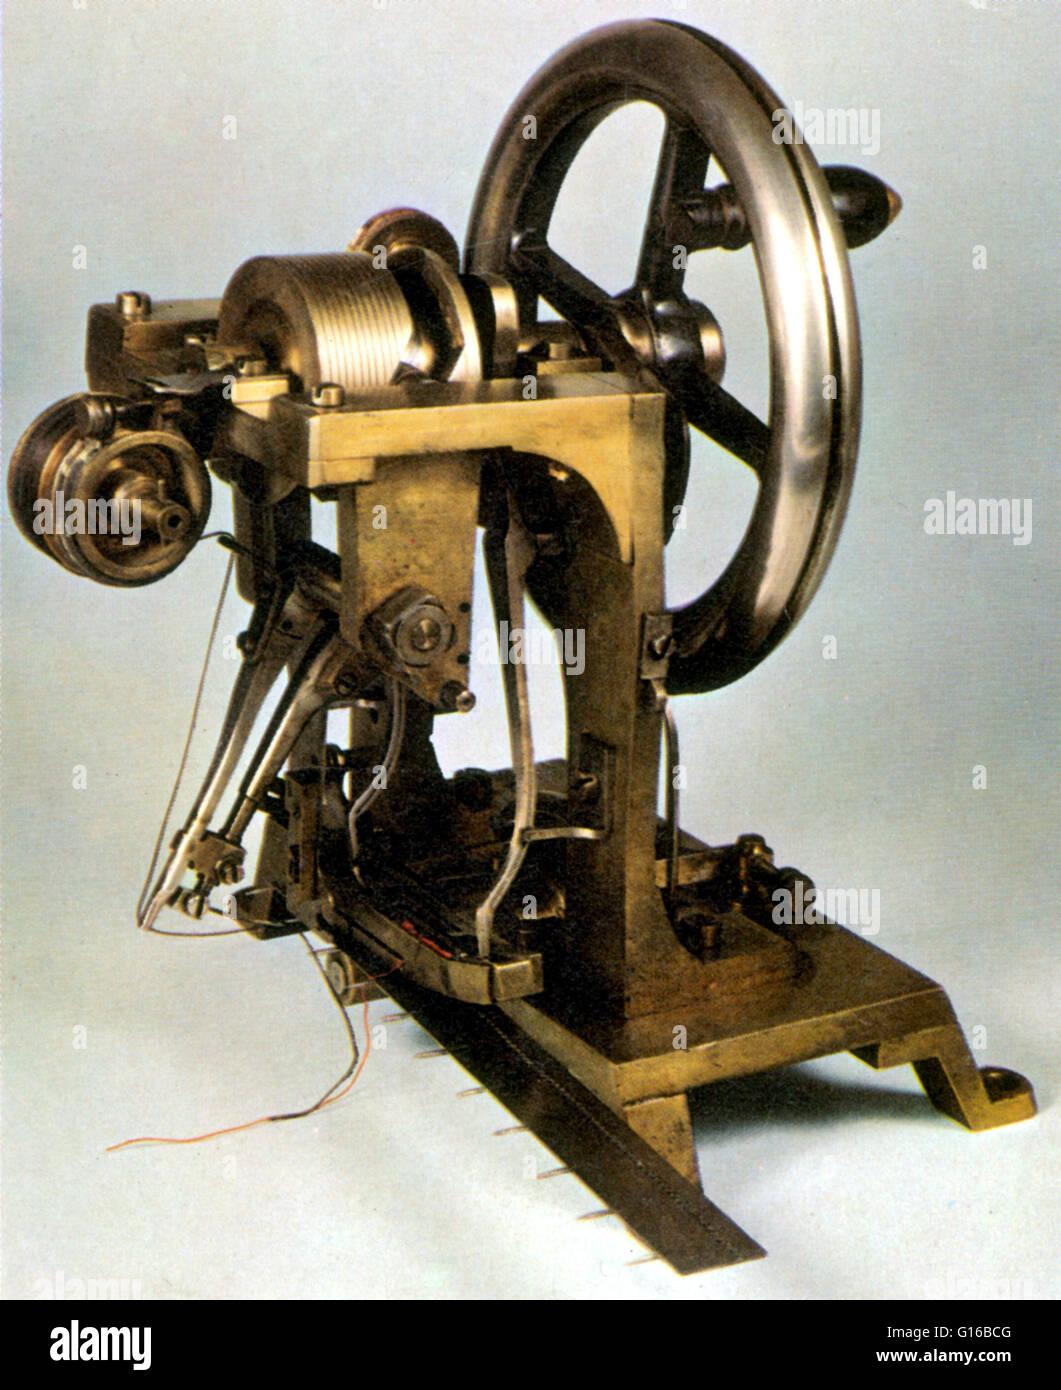 Howe's 1845 machine used lock-stitch. The shuttle loaded